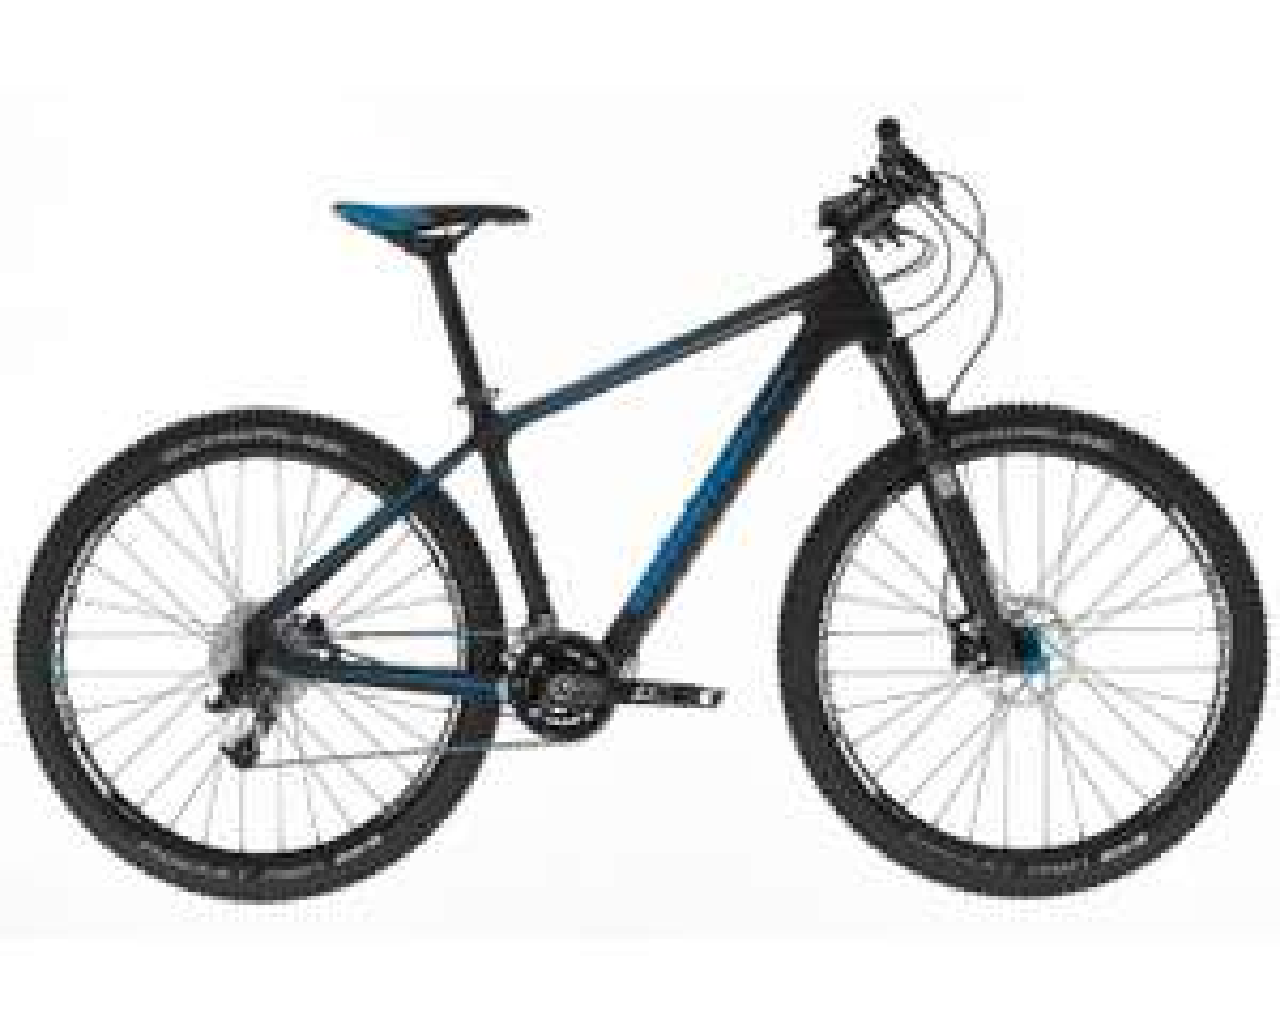 Diamondback Lumis 3.0 Mountain Bike - 2017 £875 @ merlin cycles